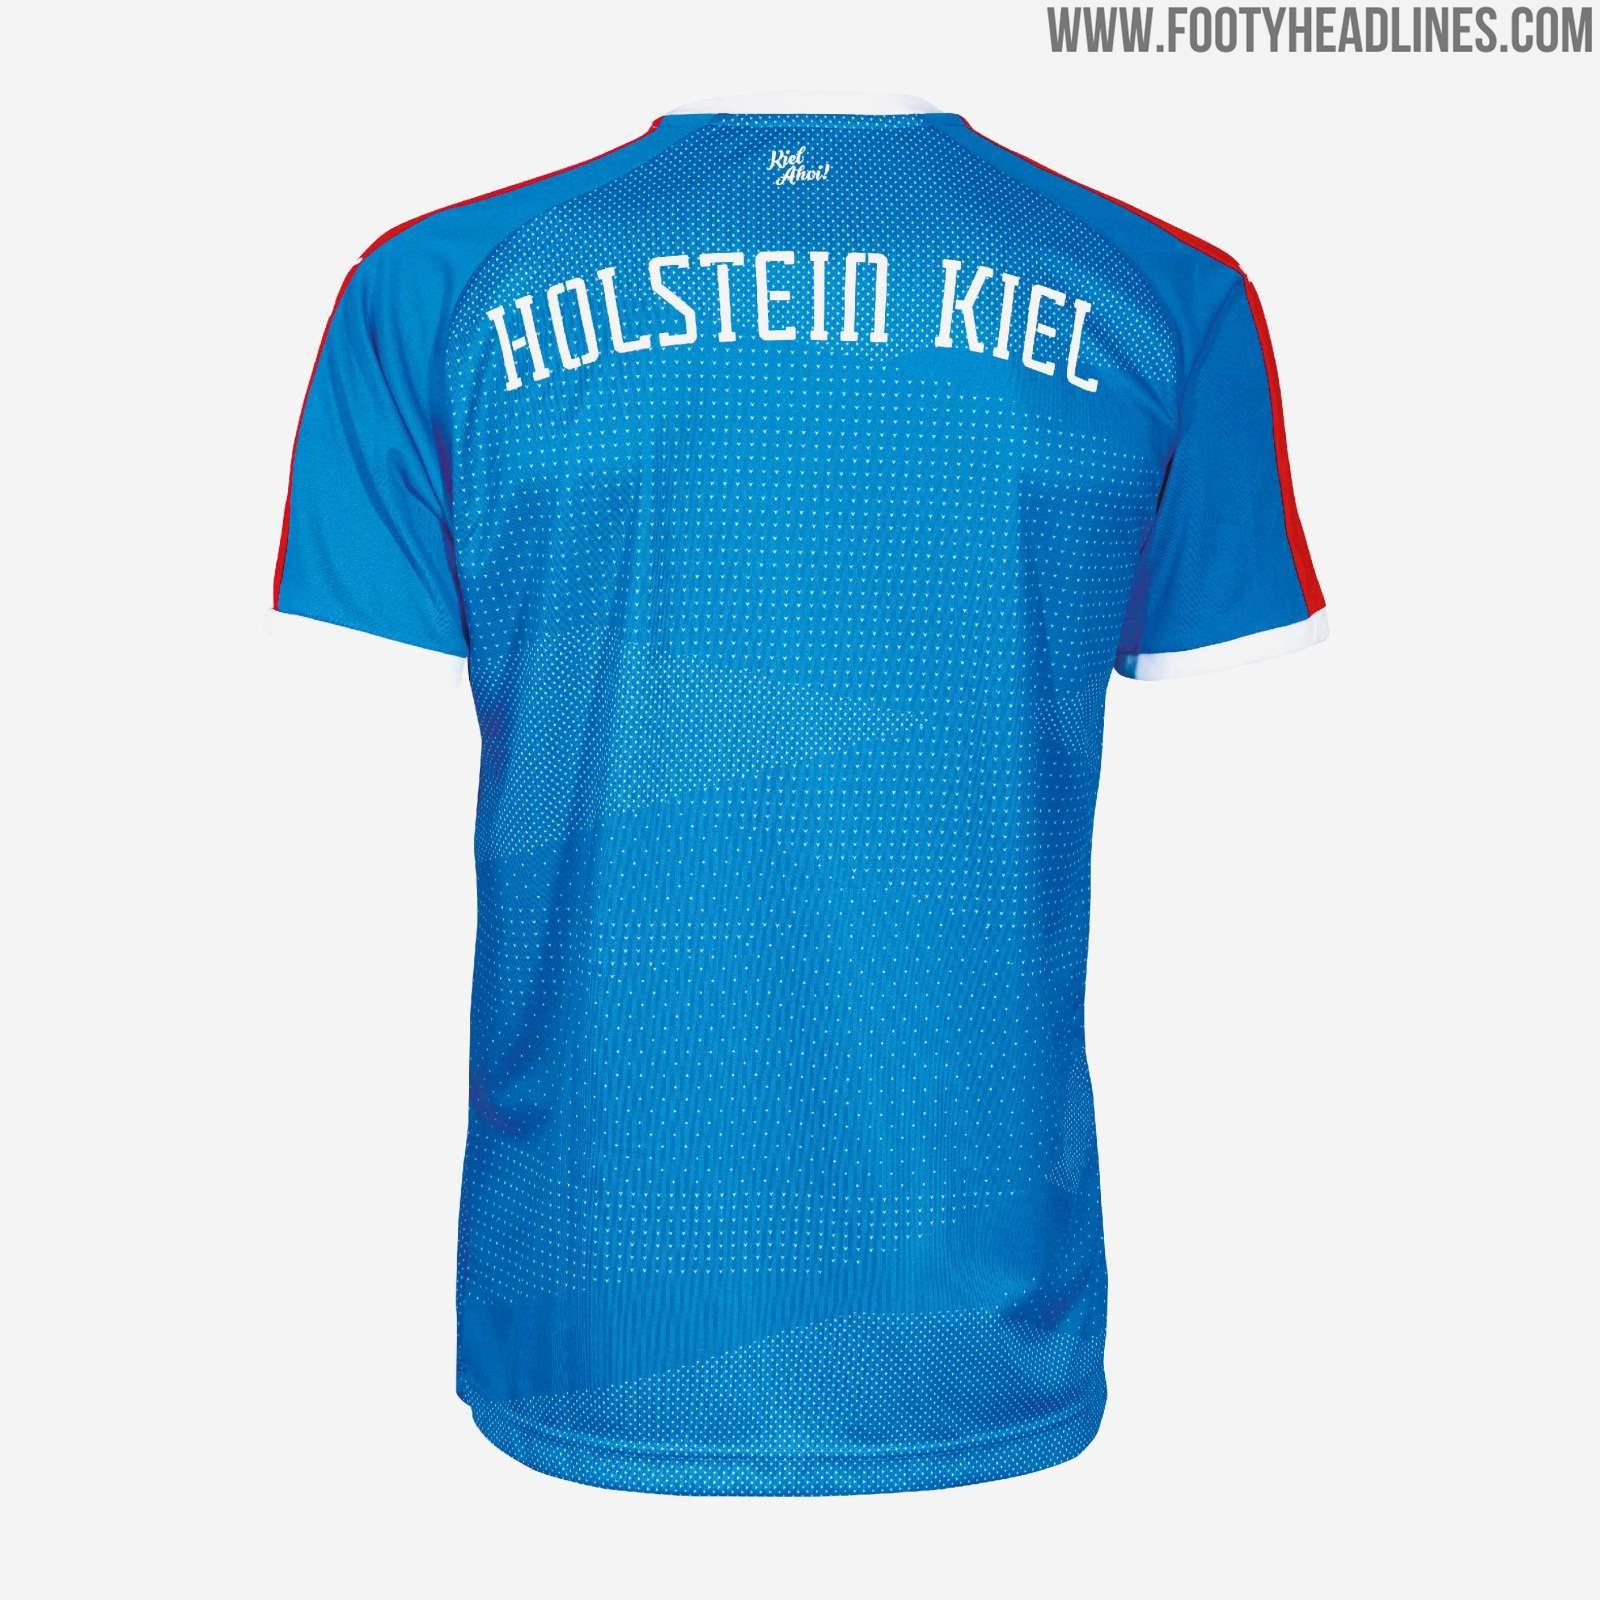 Holstein Kiel Trikot